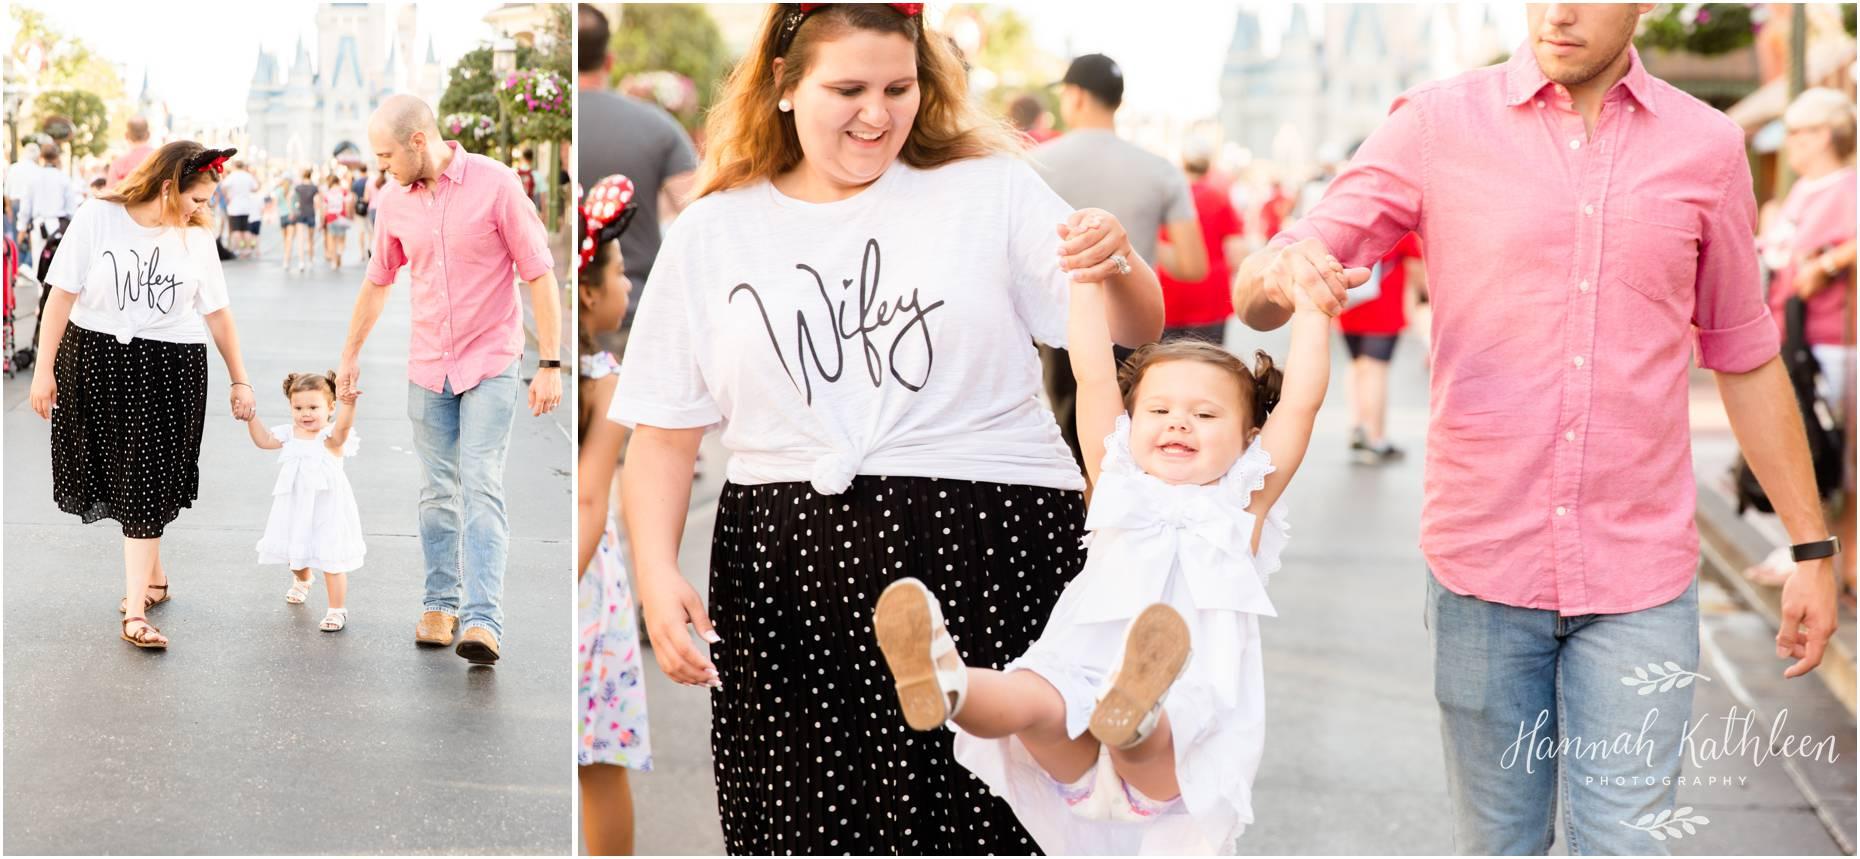 Disney_Orlando_Central_Florida_Family_Professional_Photographer